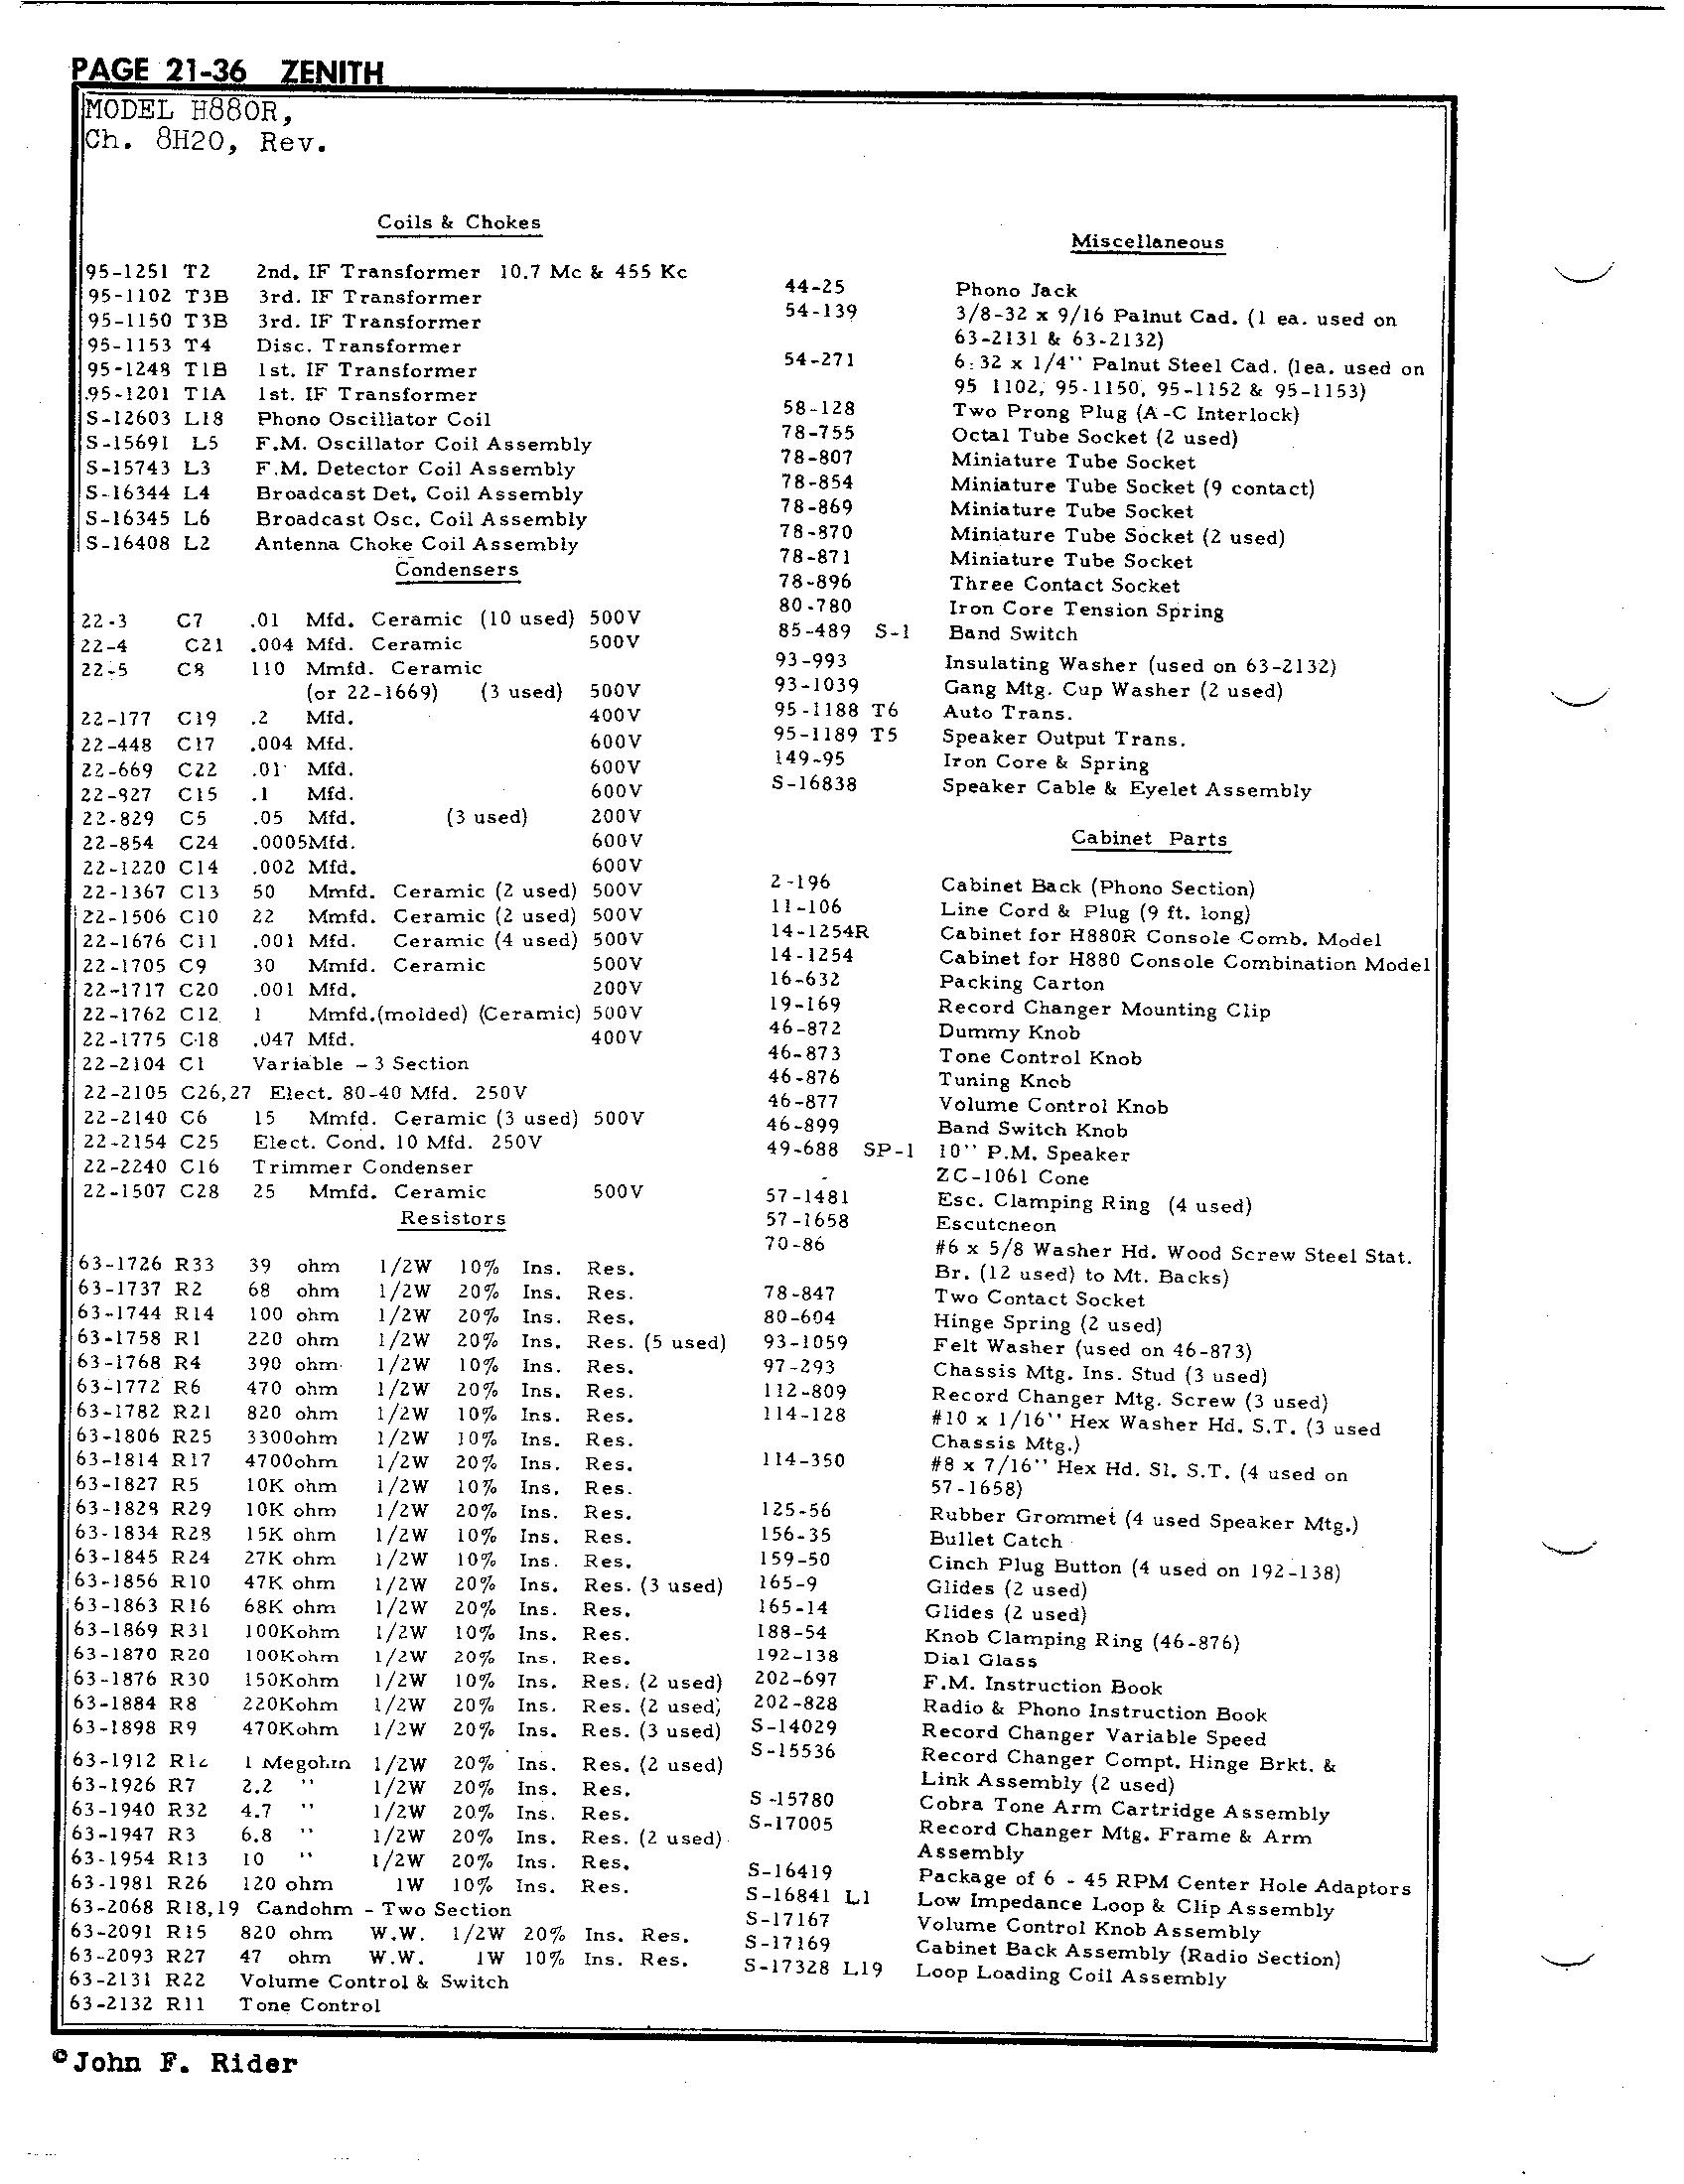 Zenith Radio Corp H880r